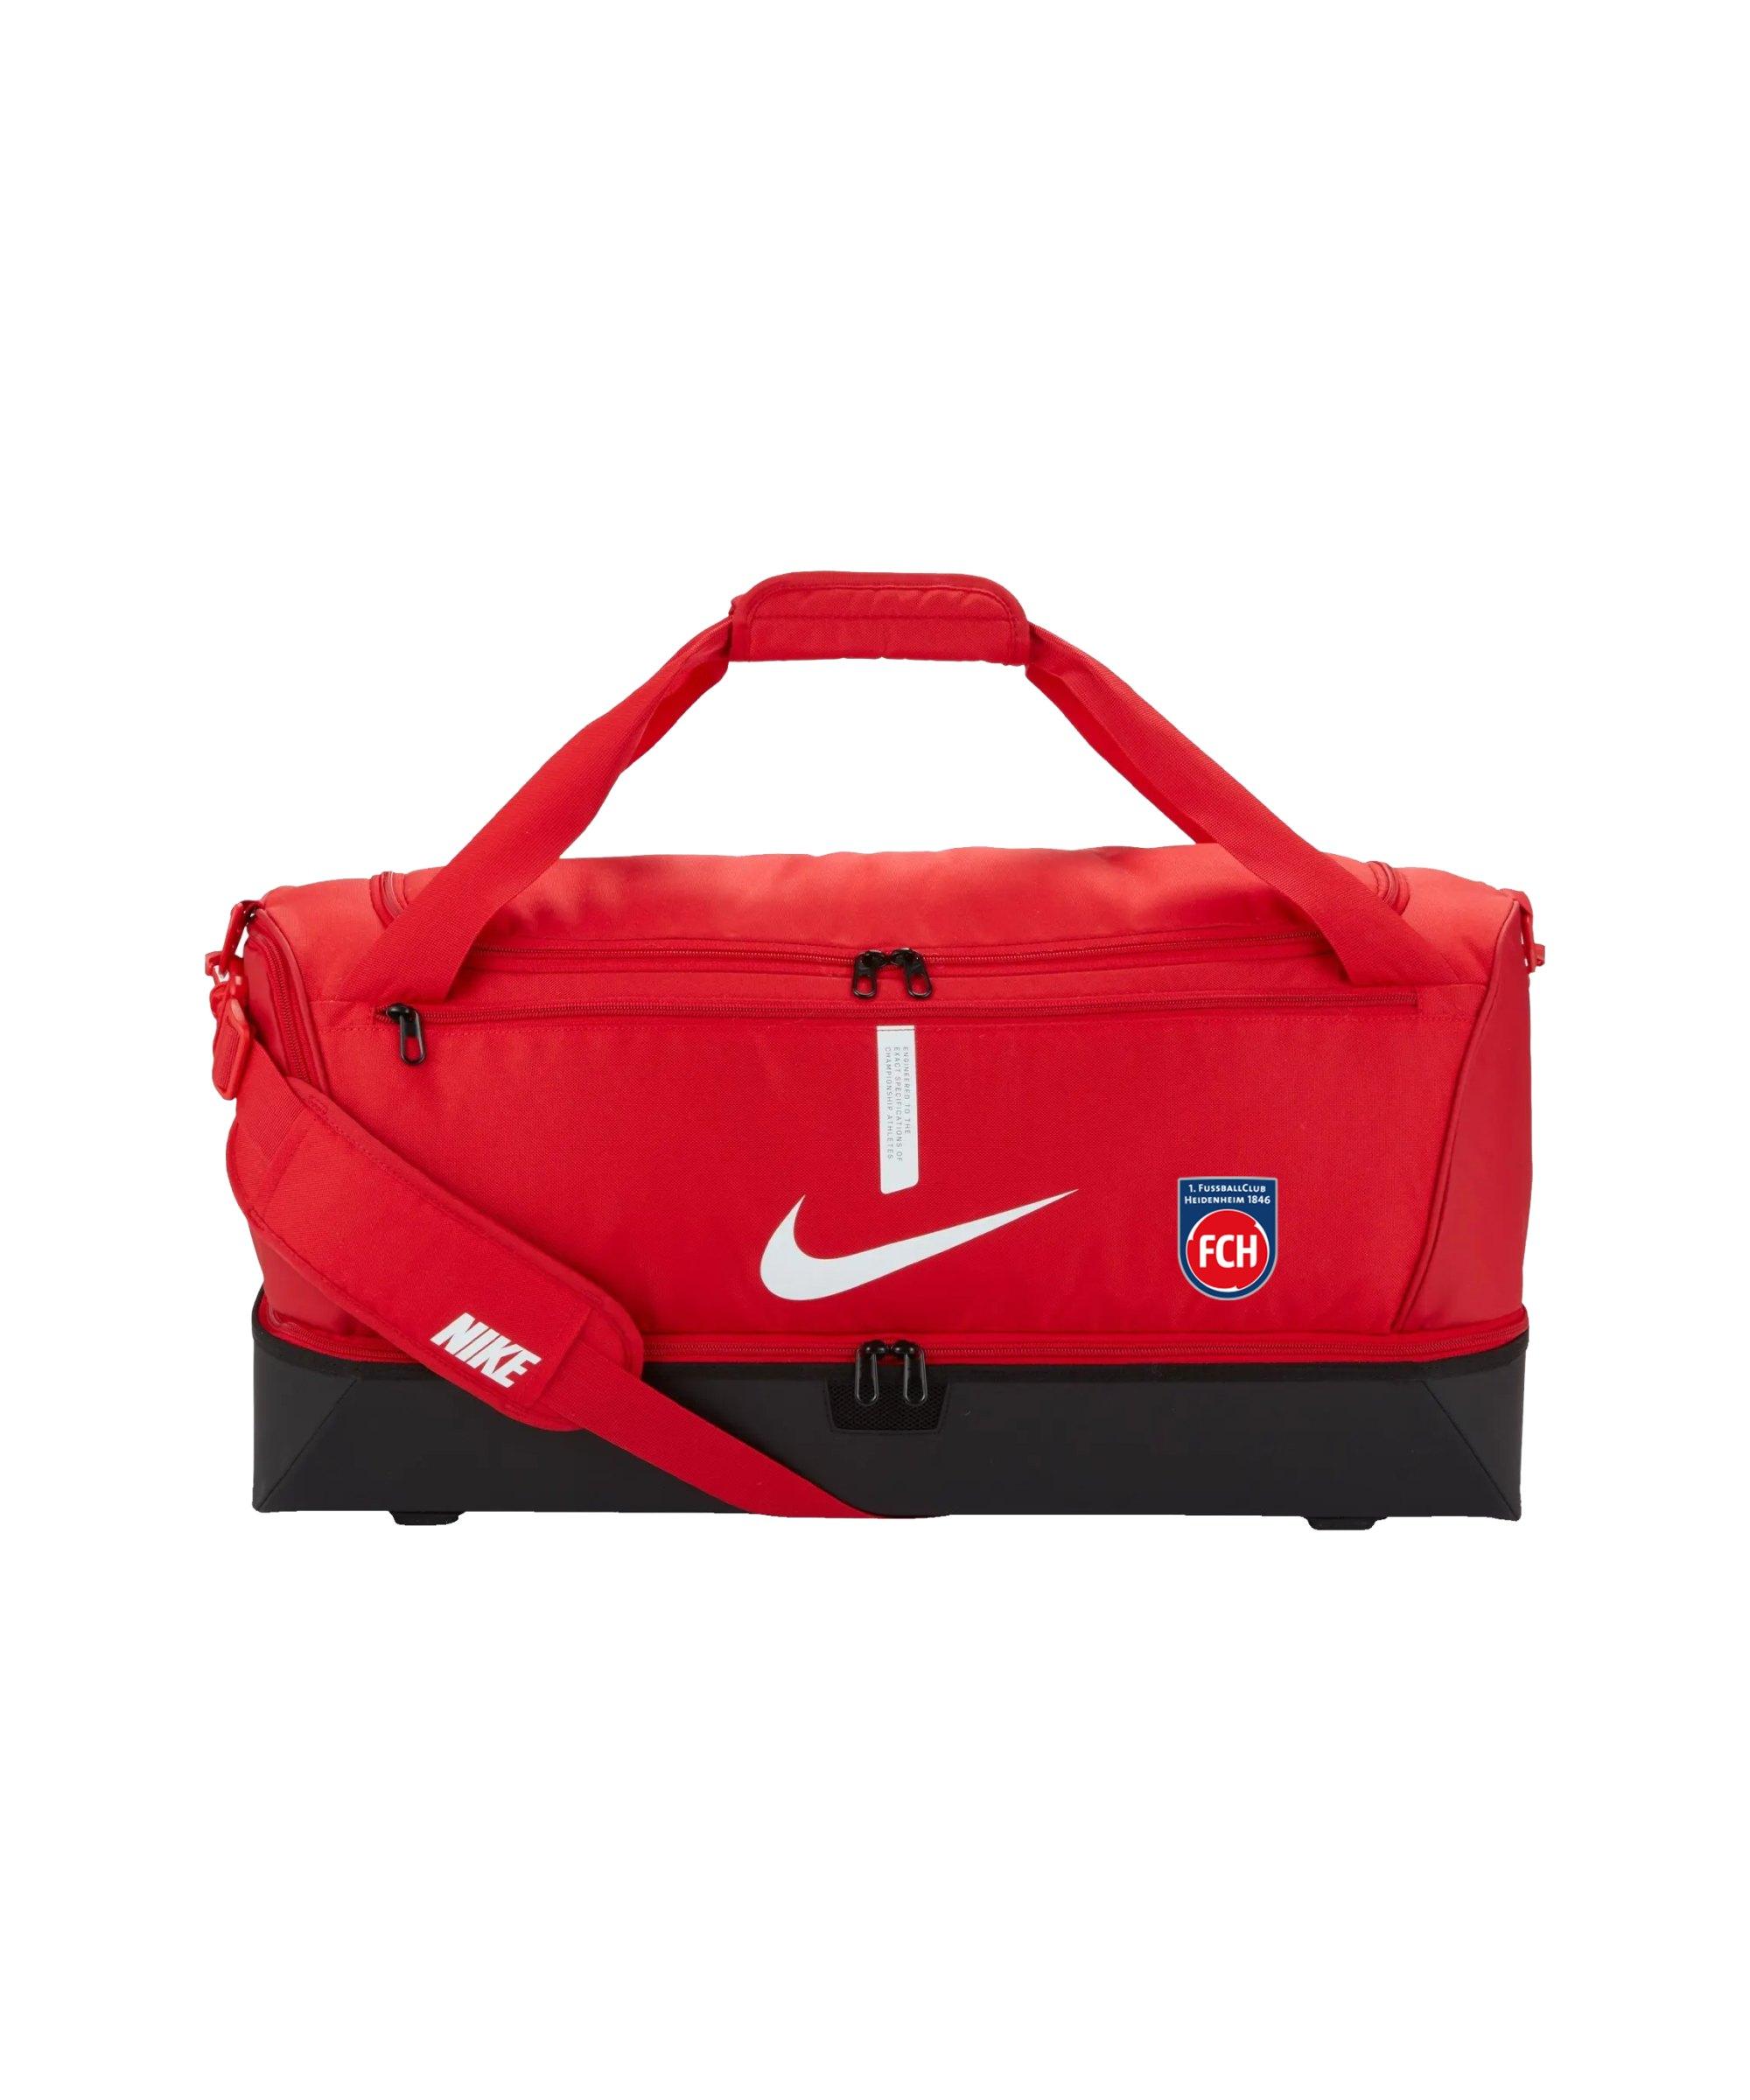 Nike 1. FC Heidenheim Tasche Rot F657 - rot